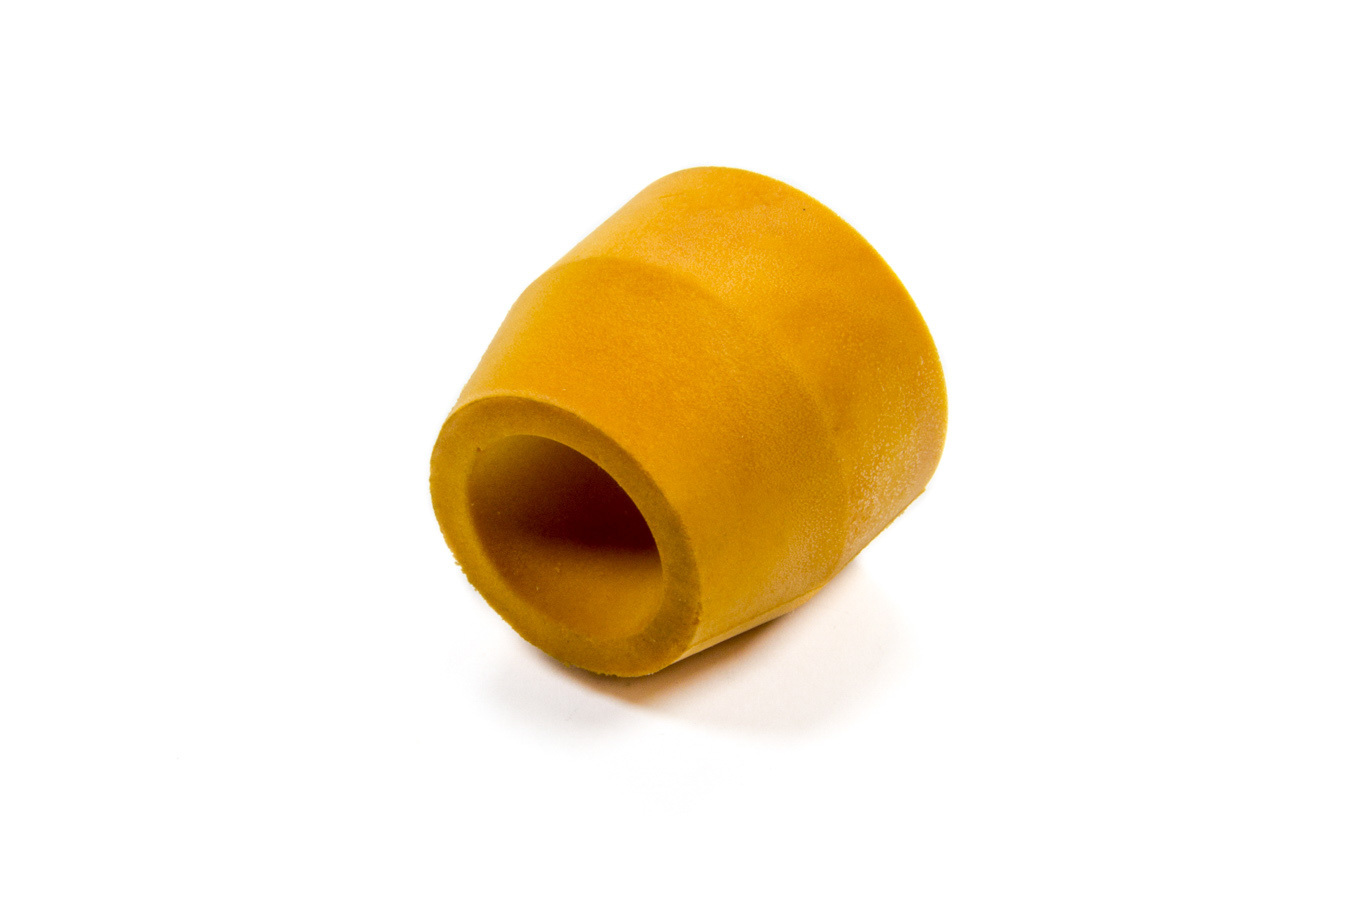 Koni Shocks 70-34-54-000-0 Bump Stop, 1.563 in Tall, 16 mm ID, Soft, Polyurethane, Yellow, Each